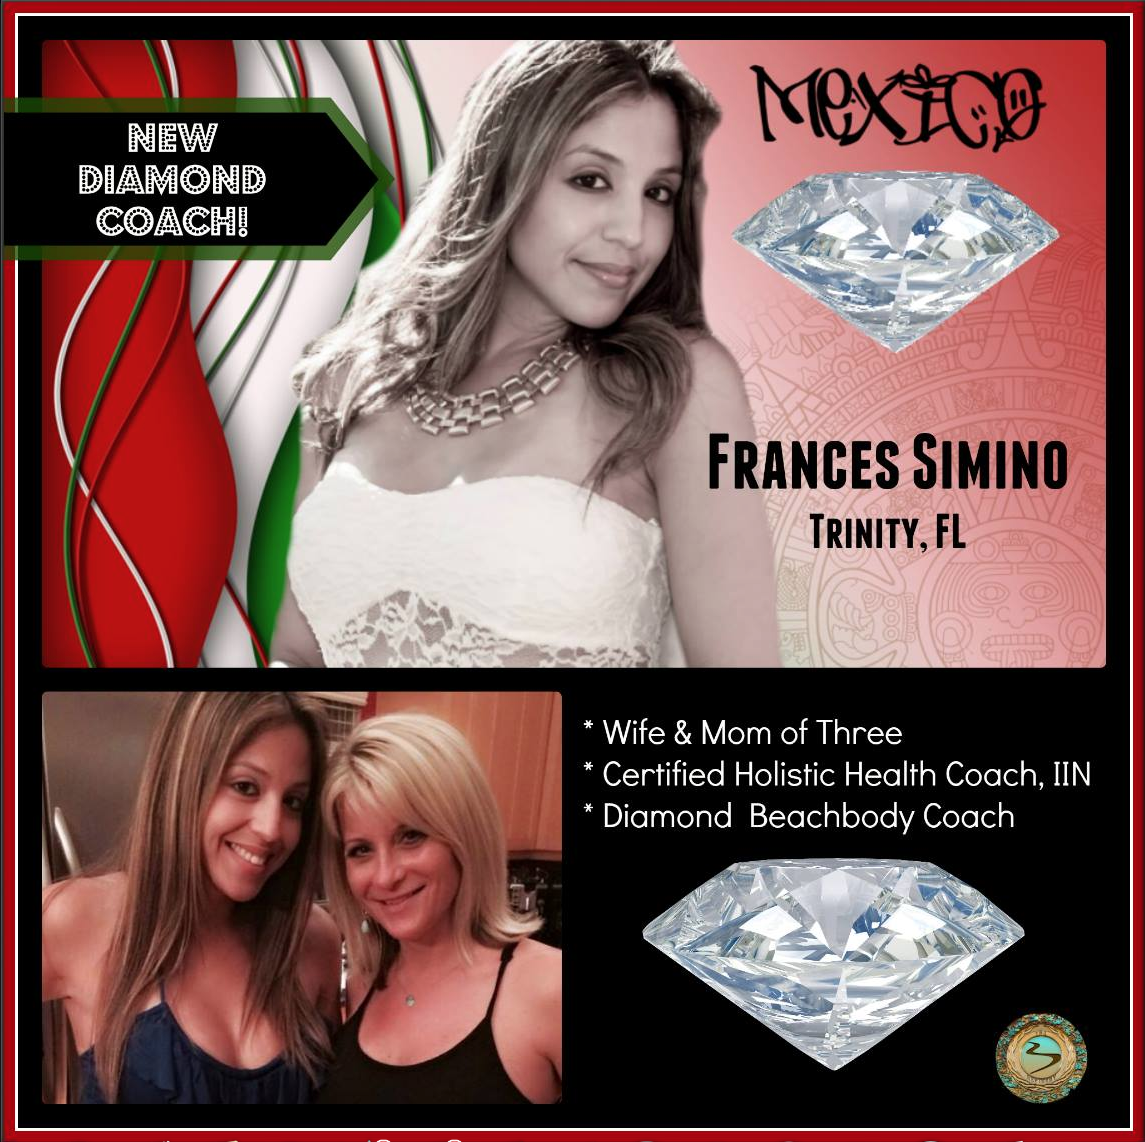 Seay Stanford Diamonds